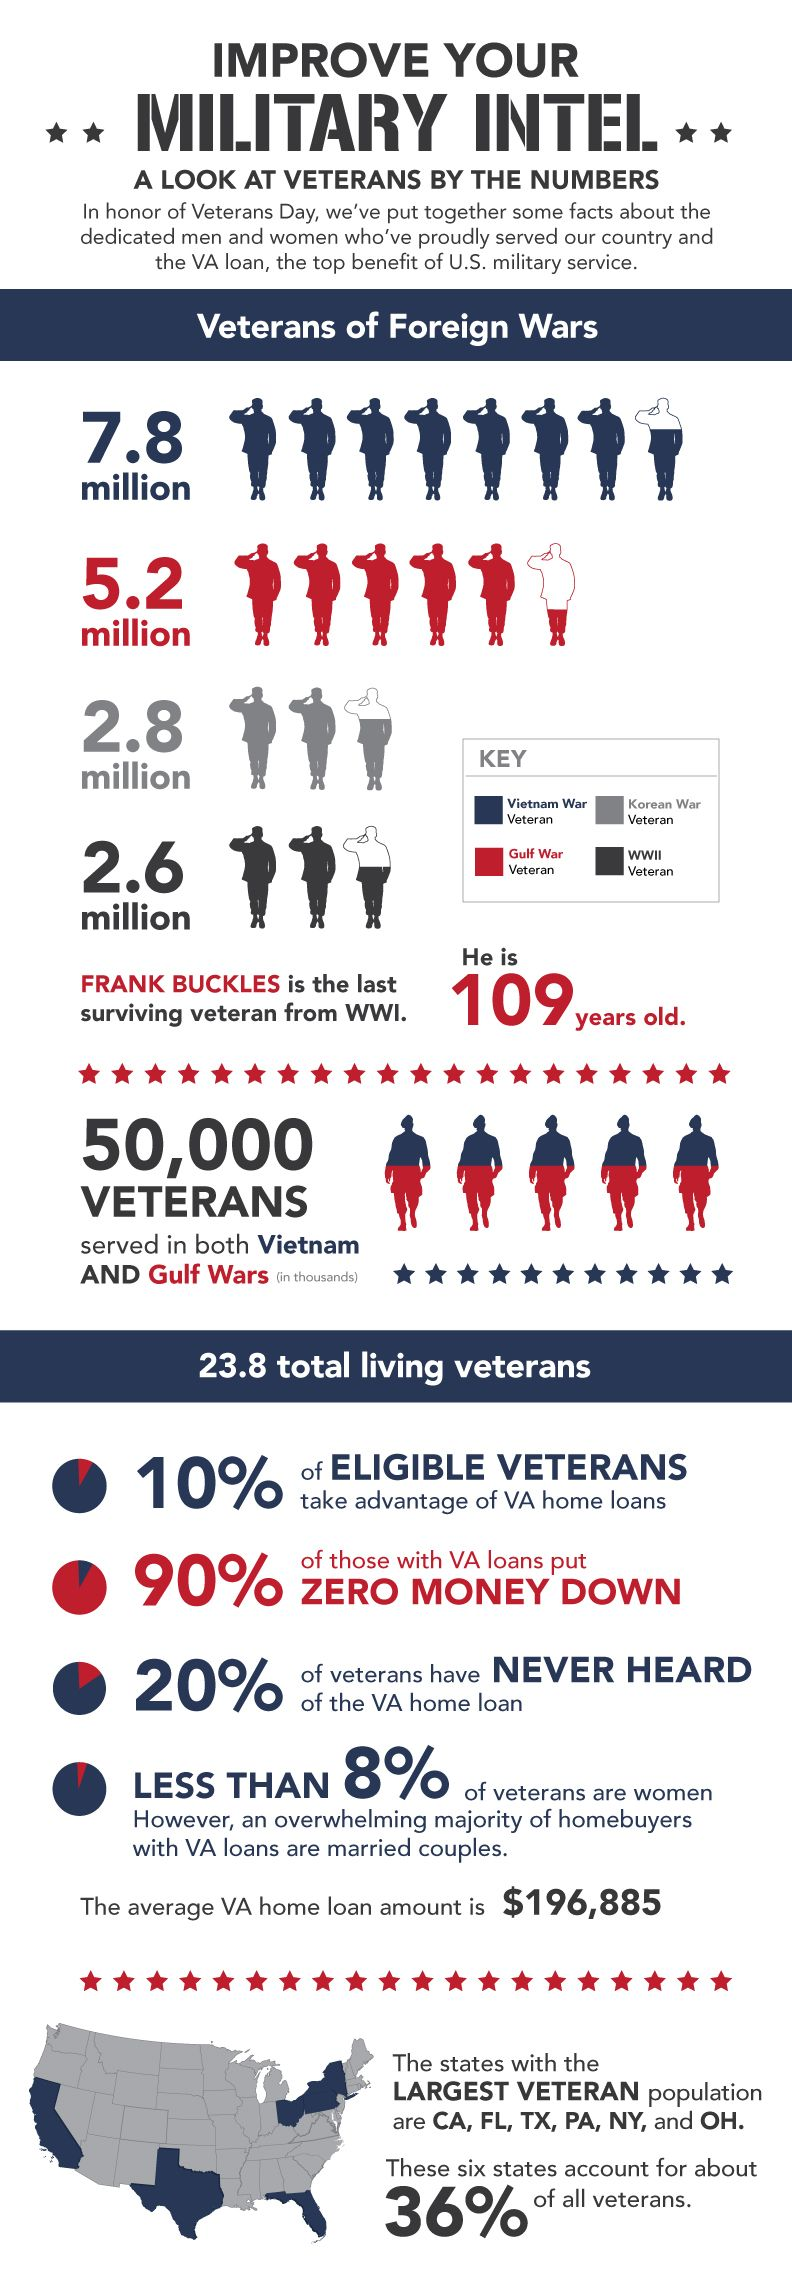 51 Good Veterans Day Slogans And Taglines Veteran Veterans Day